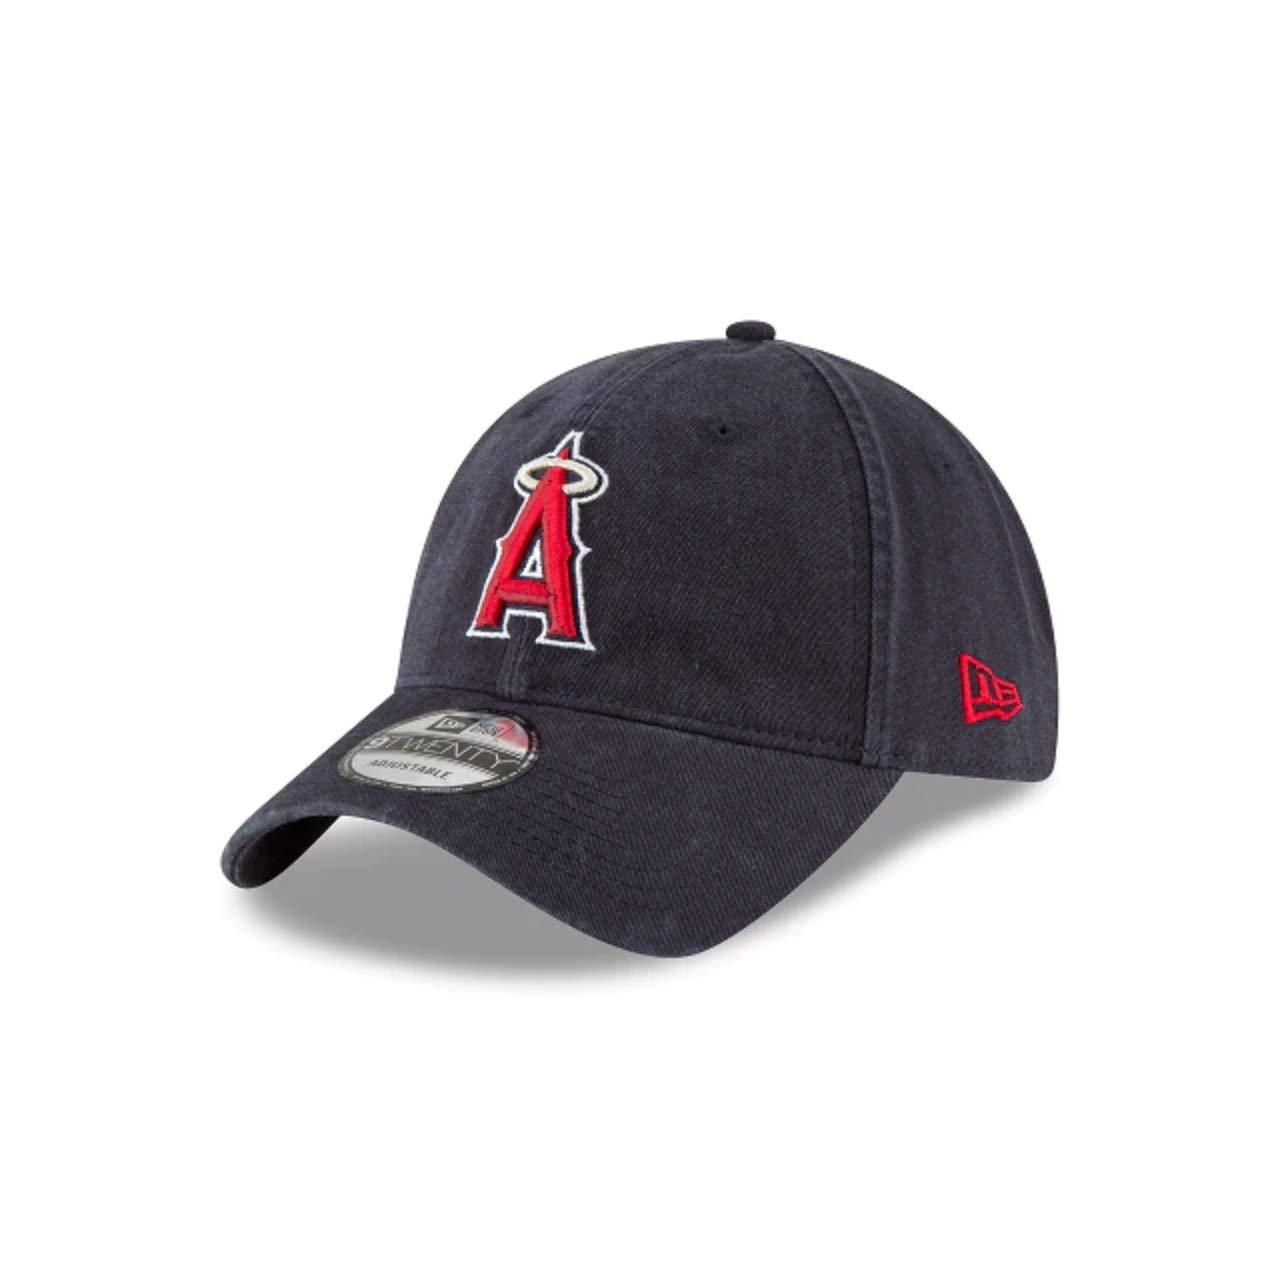 timeless design 5941a 48921 Amazon.com  New Era Core Classic 9TWENTY Adjustable Hat (Anaheim Angels ( Navy))  Clothing